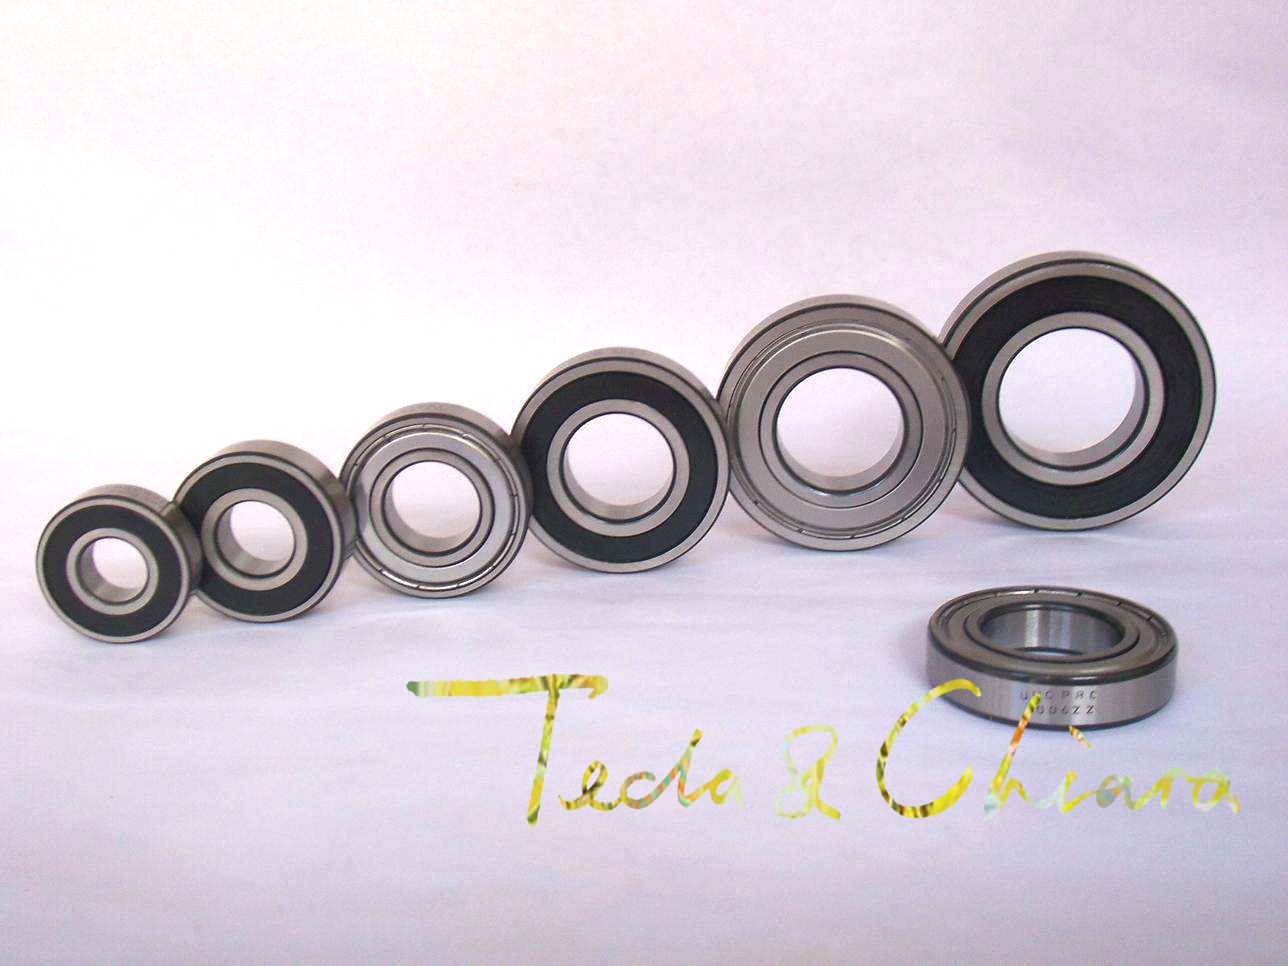 606 606ZZ 606RS 606-2Z 606Z 606-2RS ZZ RS RZ 2RZ Deep Groove Ball Bearings 6 X 17 X 6mm